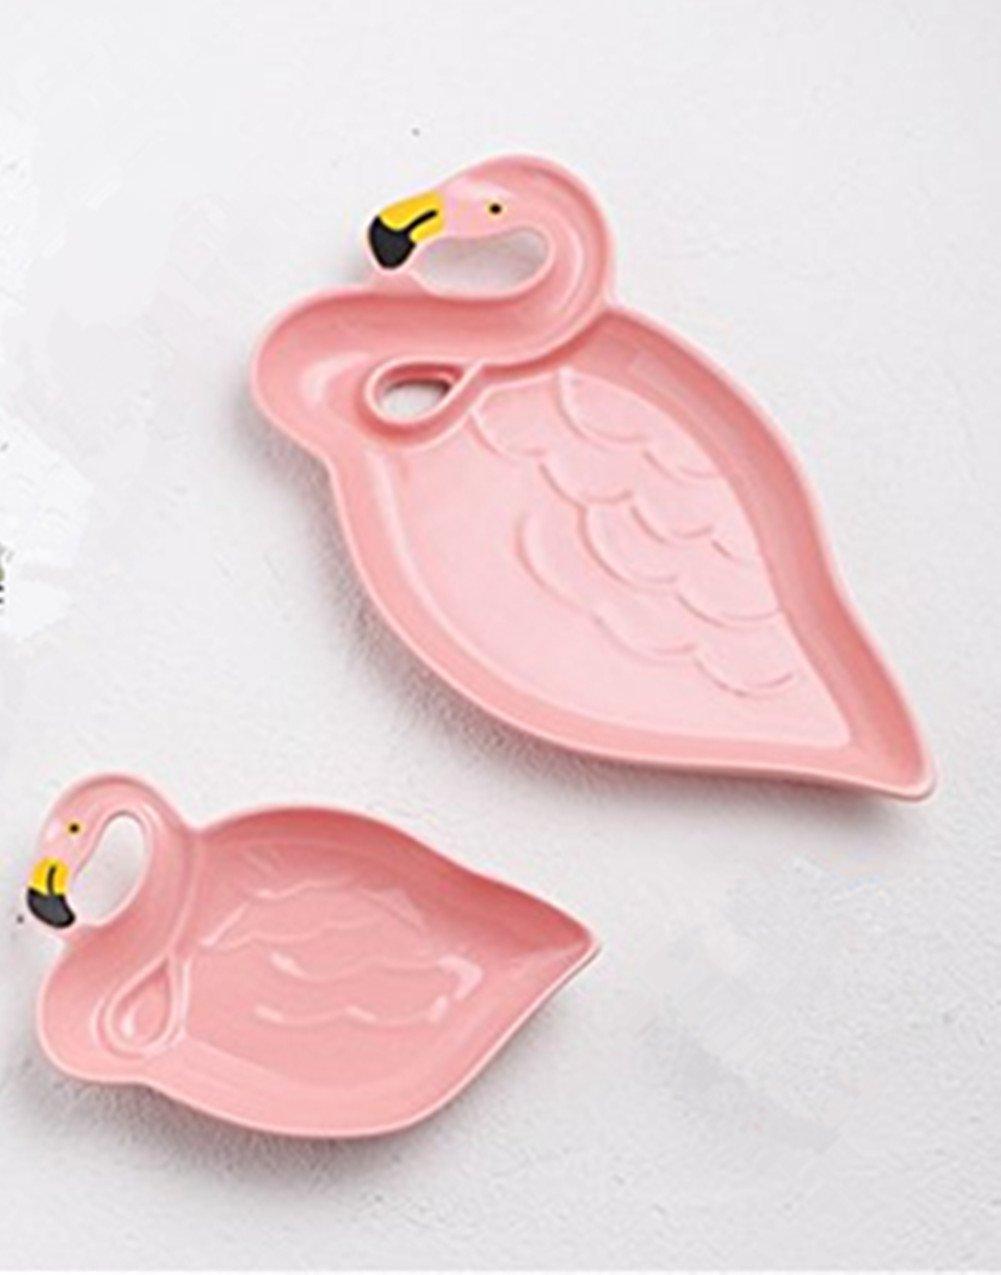 Strand Party 2 Packung 2 Packung HomeYoo Porzellan Pink Flamingo Salat-Dessert Teller Keramik Dinner Plate Snack Tray f/ür zu Hause Geburtstag